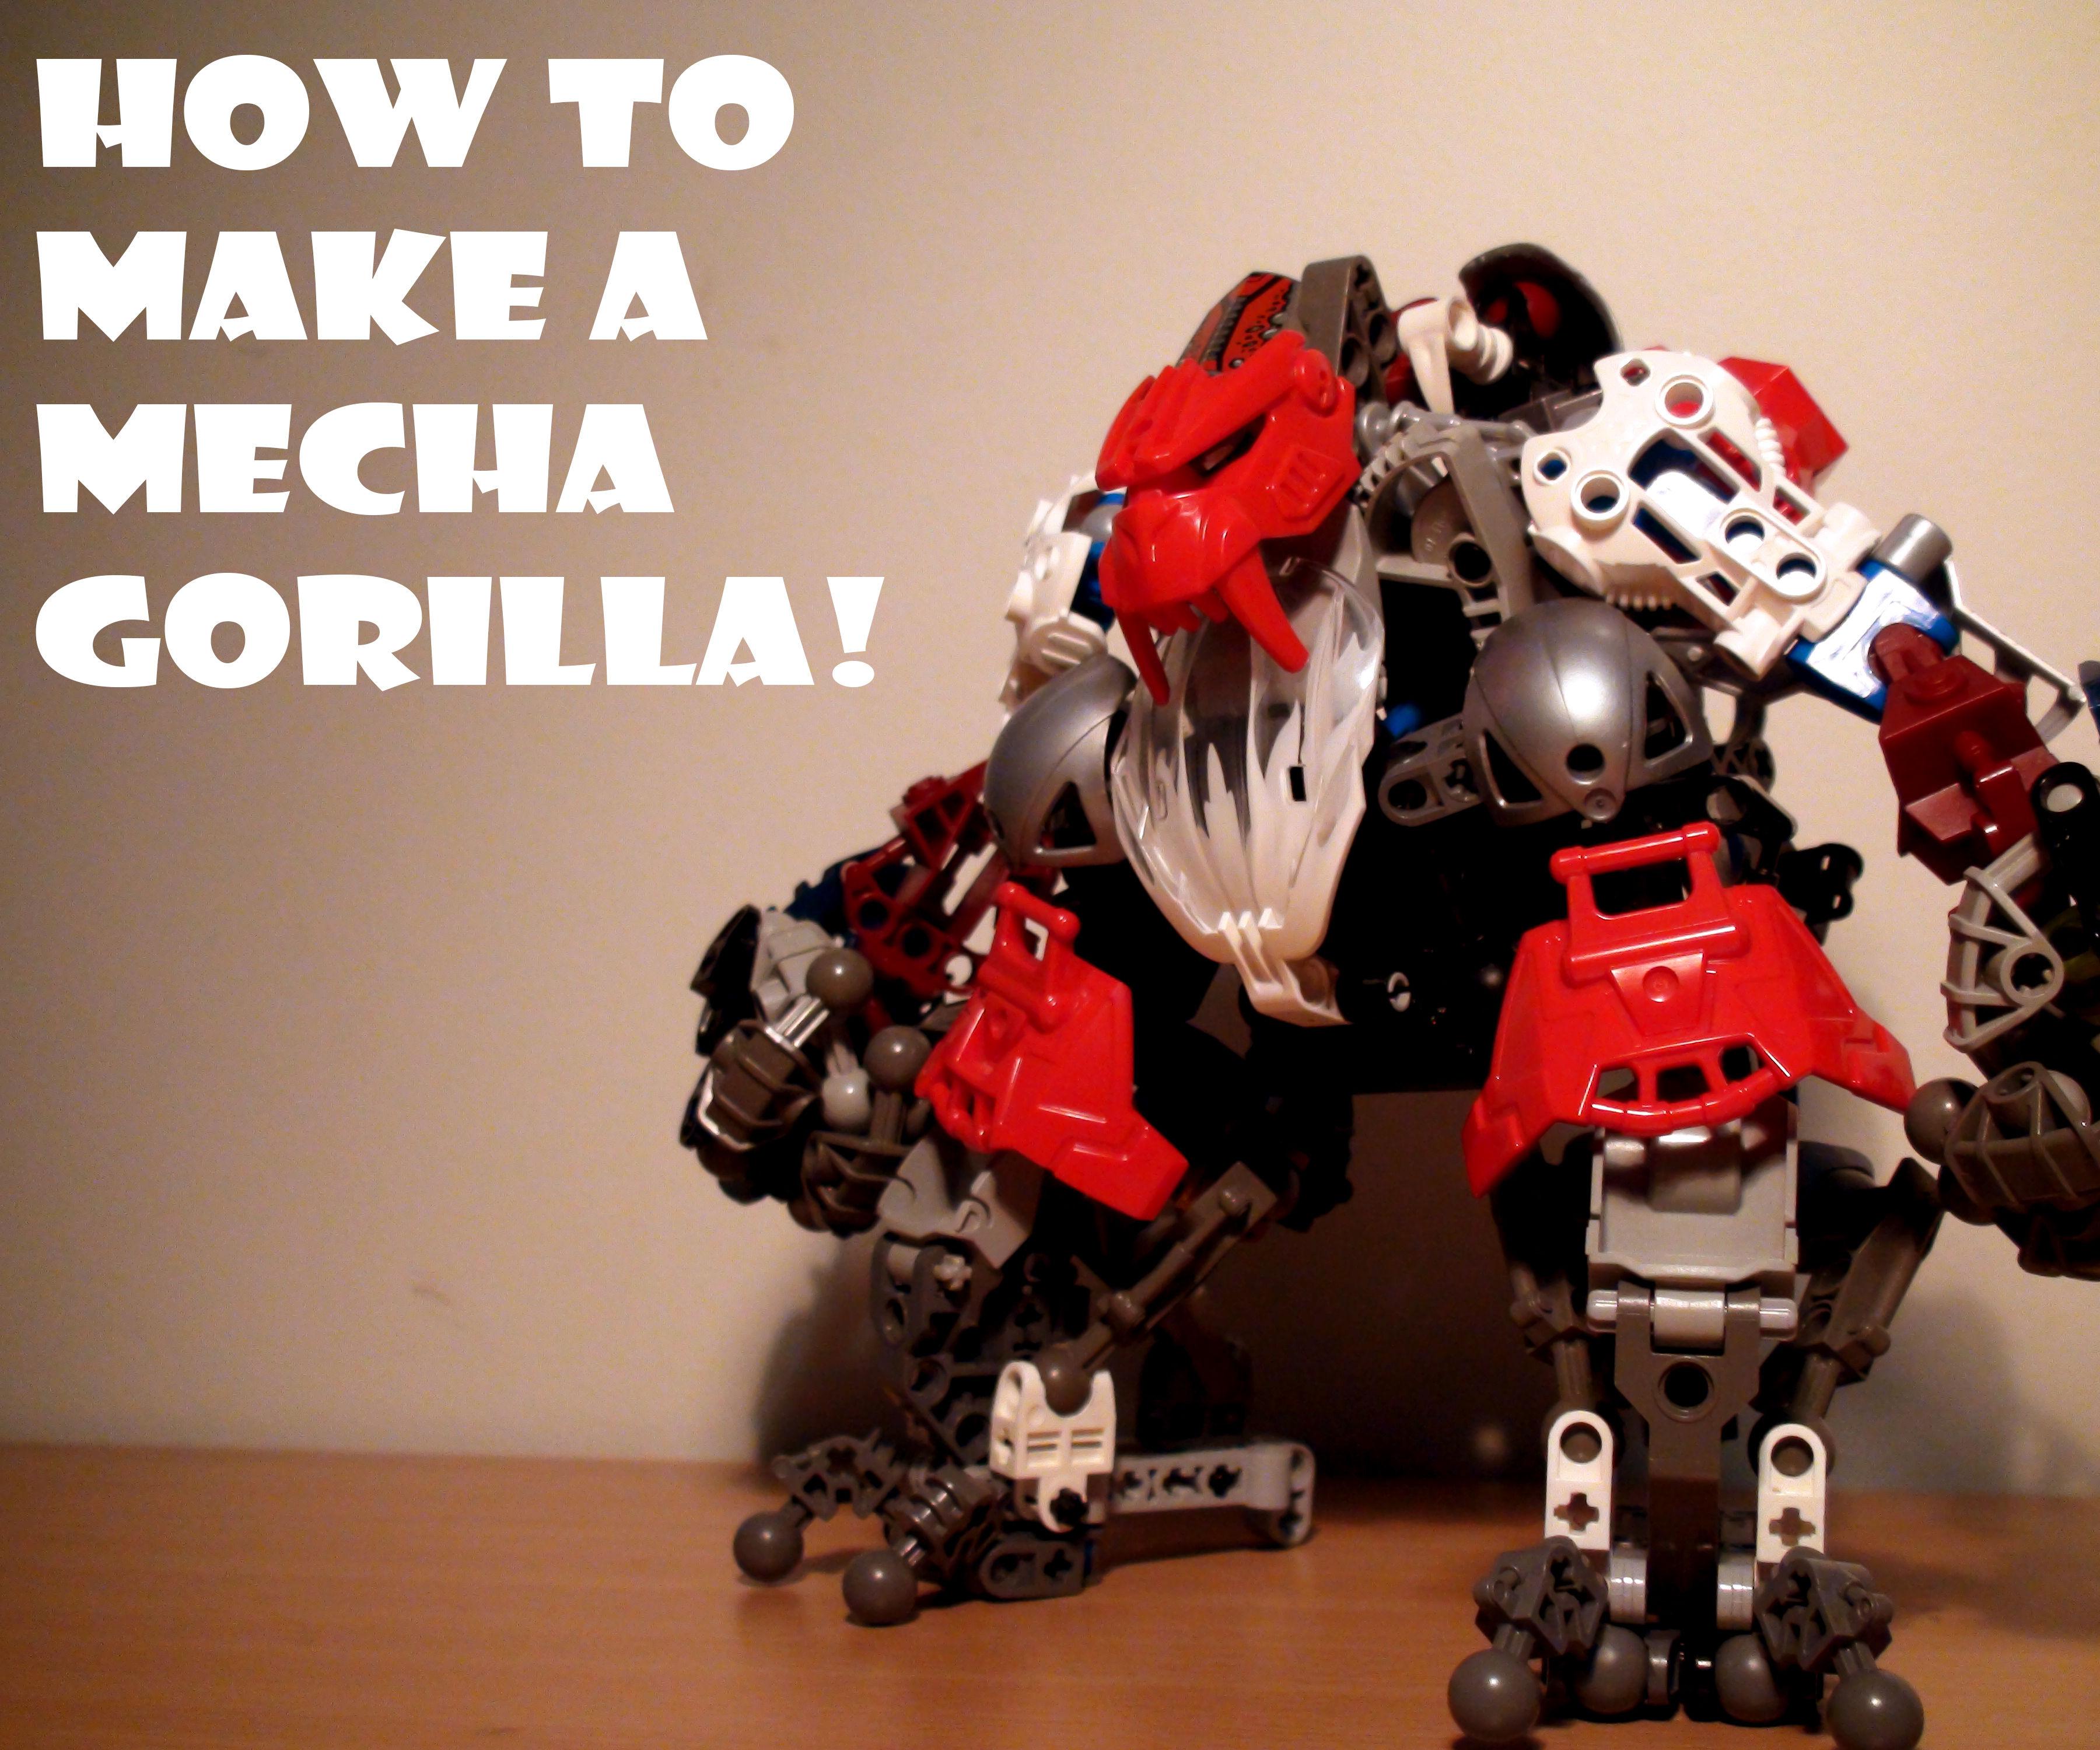 Make a Mecha Gorilla from Bionicles!